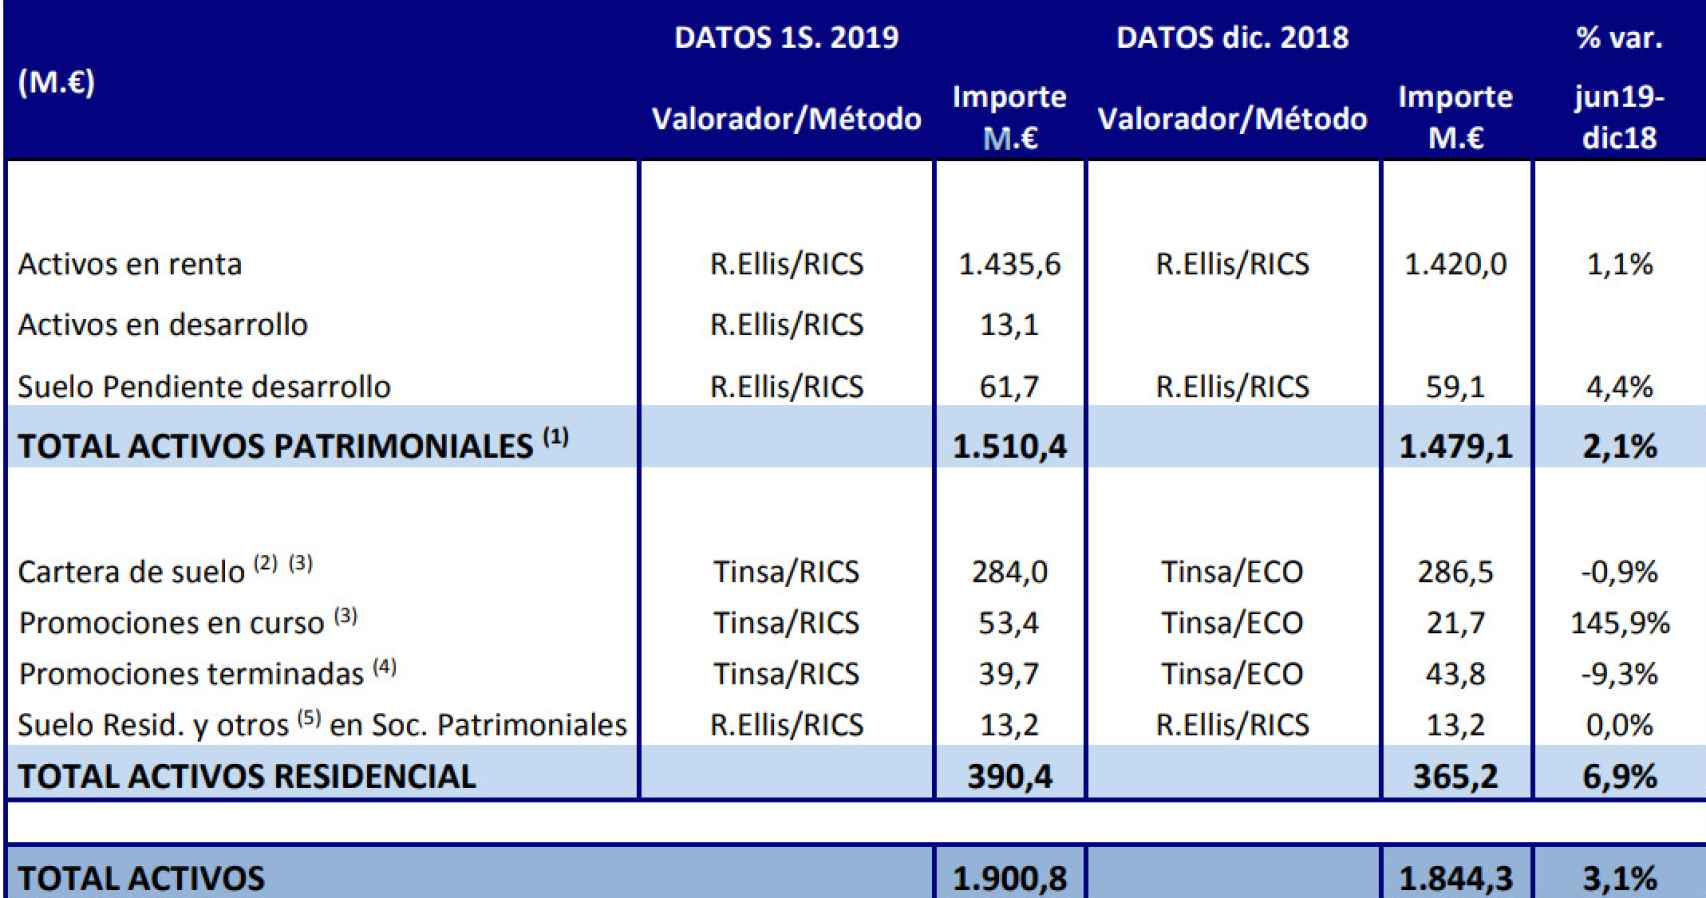 Datos enviados por Realia a la CNMV